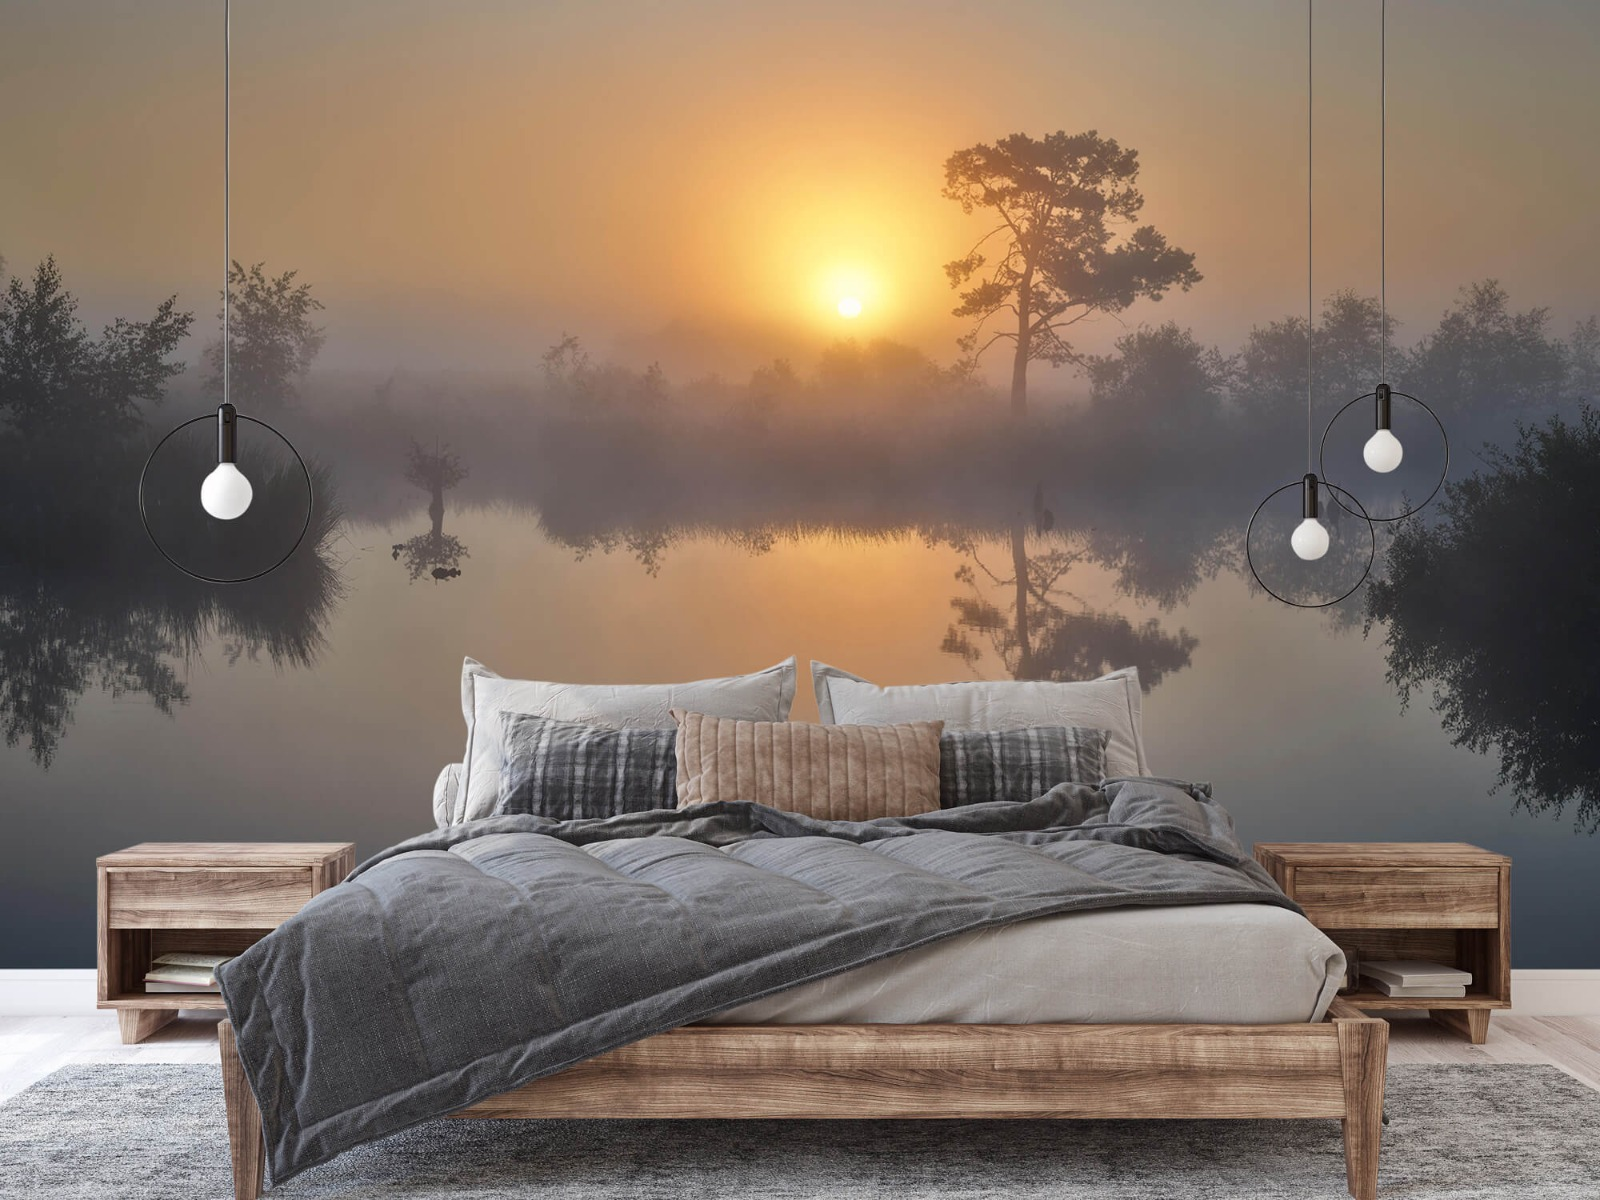 Natuur - Mistige zonsopkomst 3